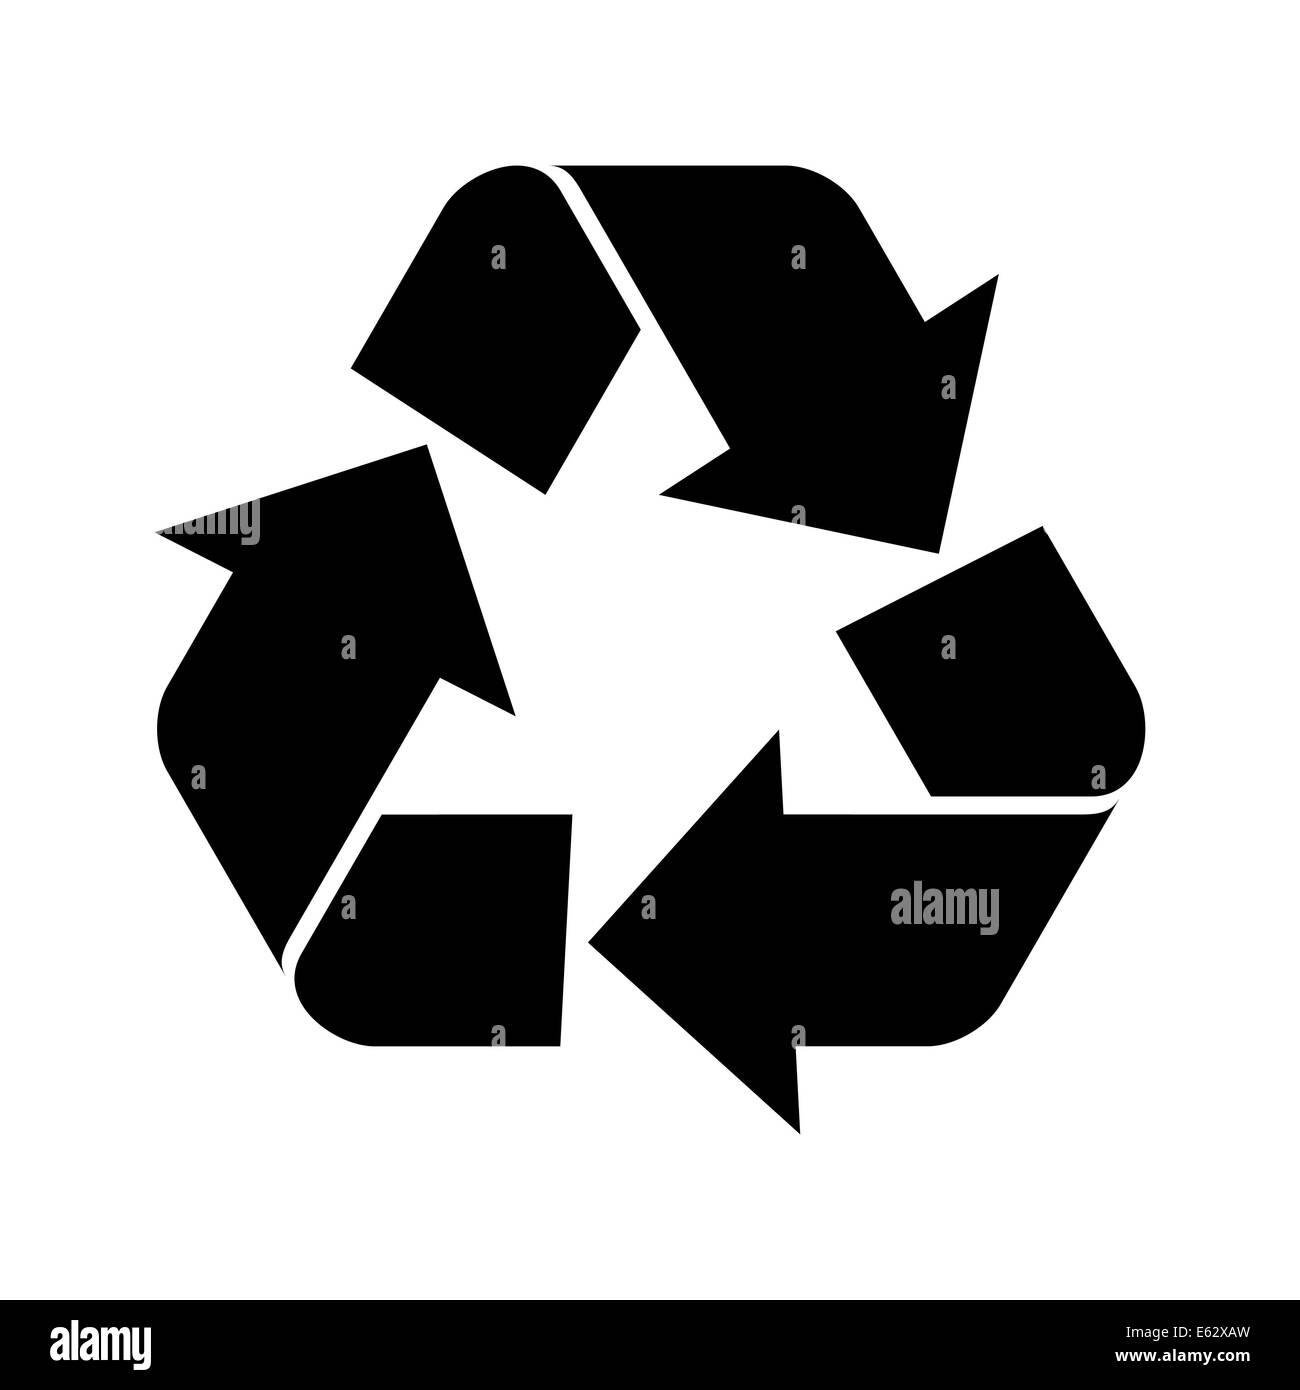 Recycle Symbol Black Stock Photos Recycle Symbol Black Stock